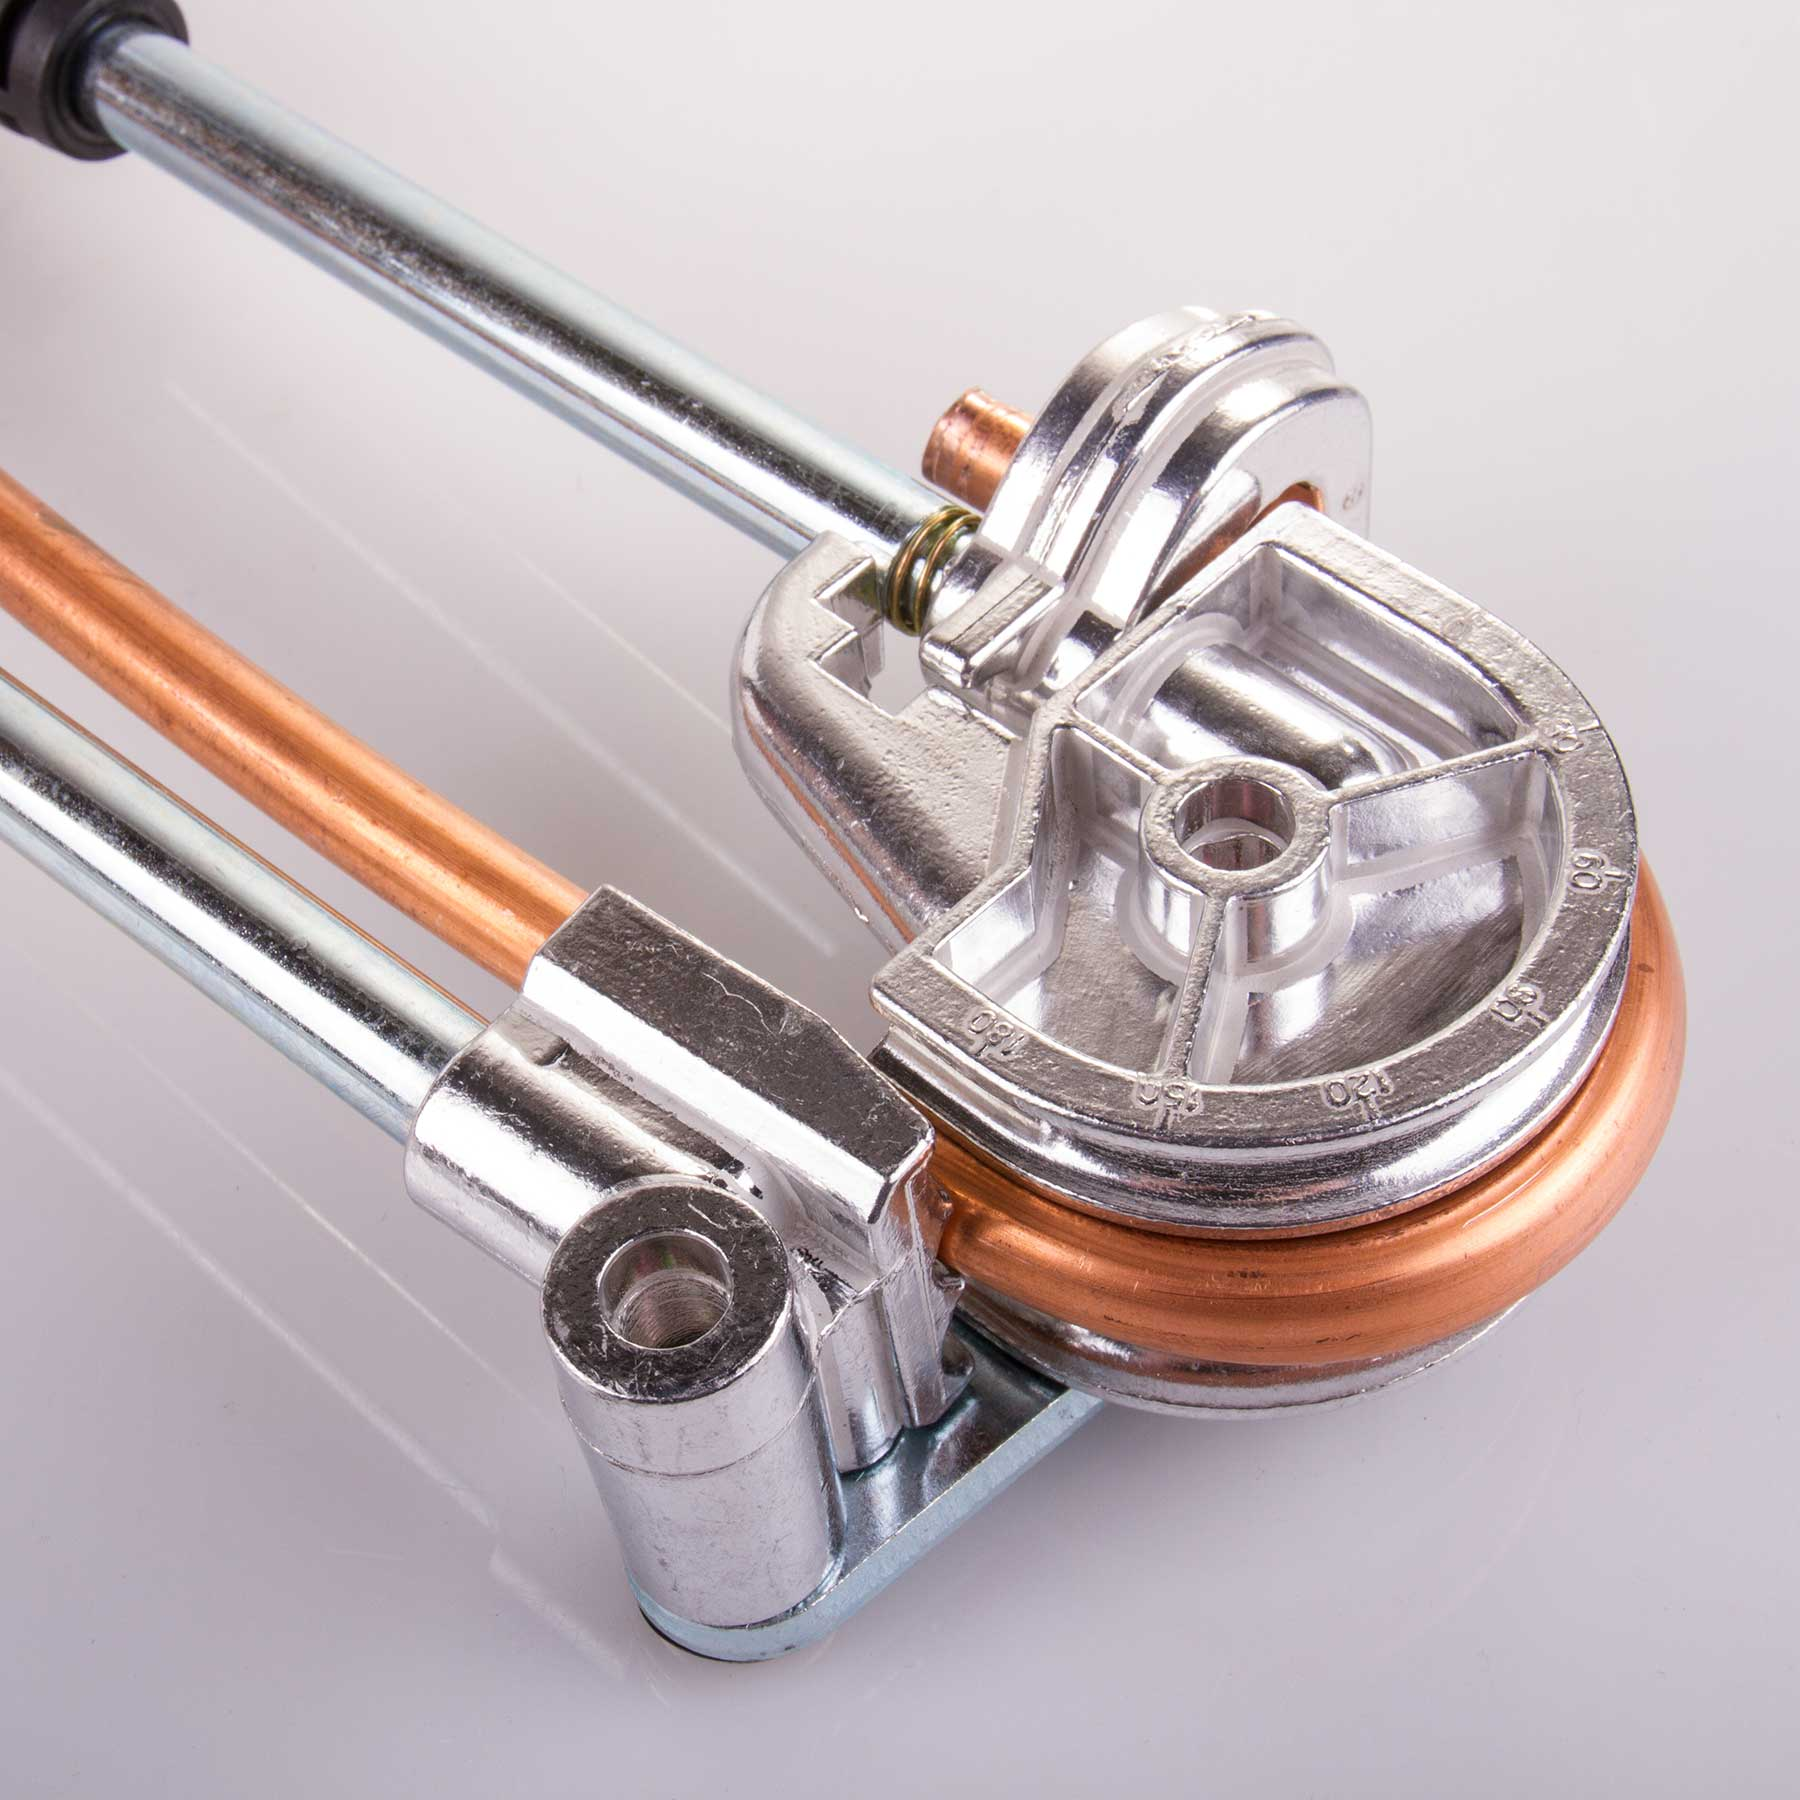 Draper Micro Tube Bender Bending Brake Pipe Tool for 8mm 10mm 12mm Tubing 72376